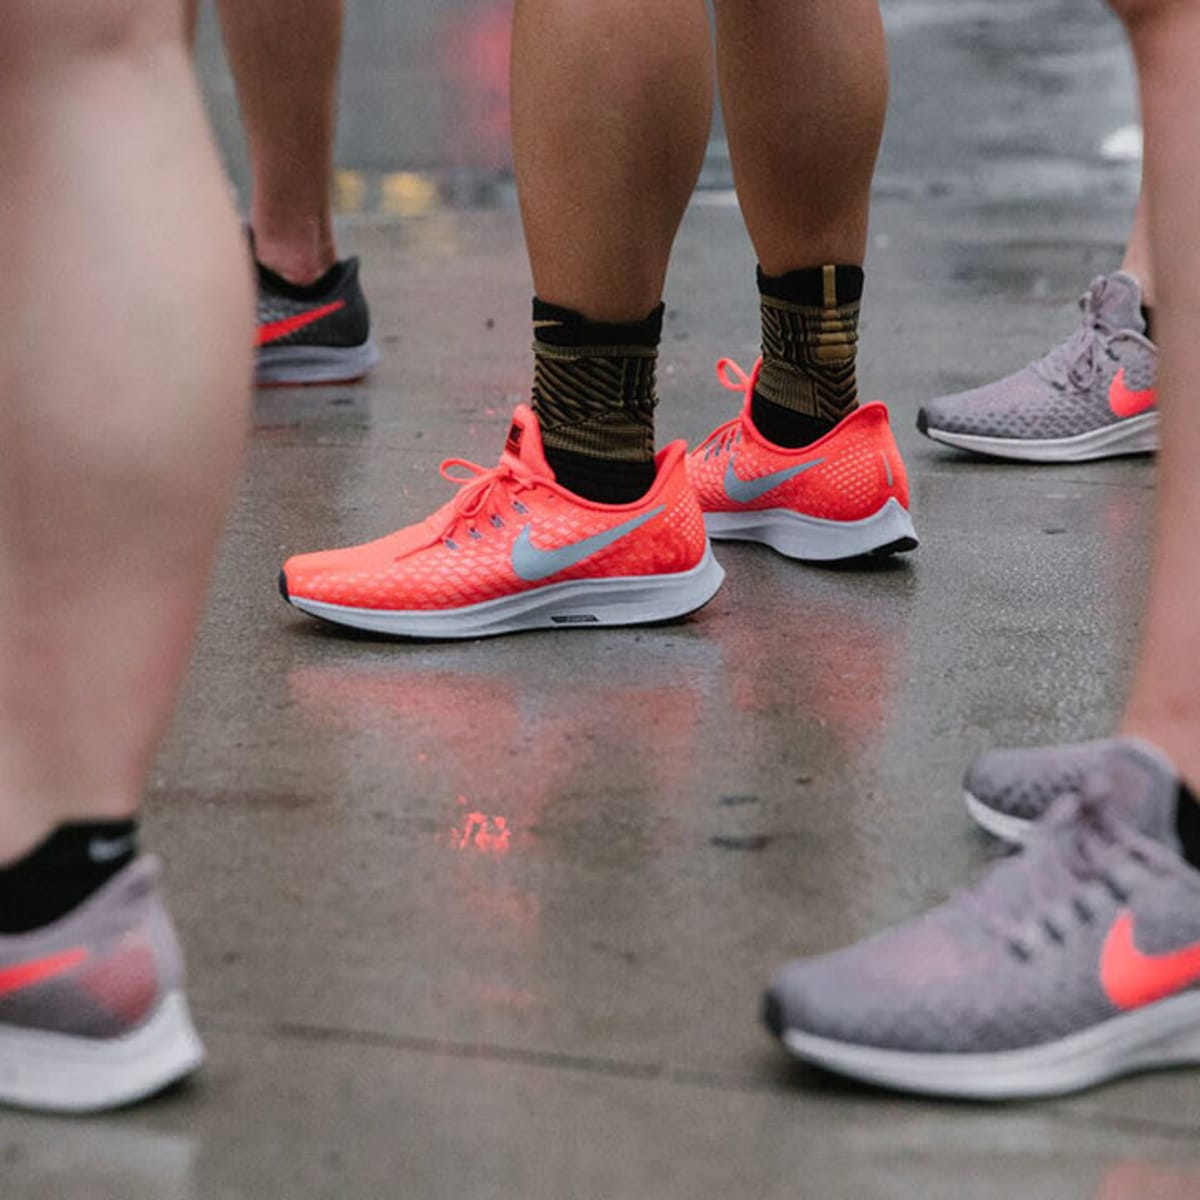 Juventud póngase en fila Andrew Halliday  Nike Pegasus 35 Running Shoe review, details - Sports Illustrated